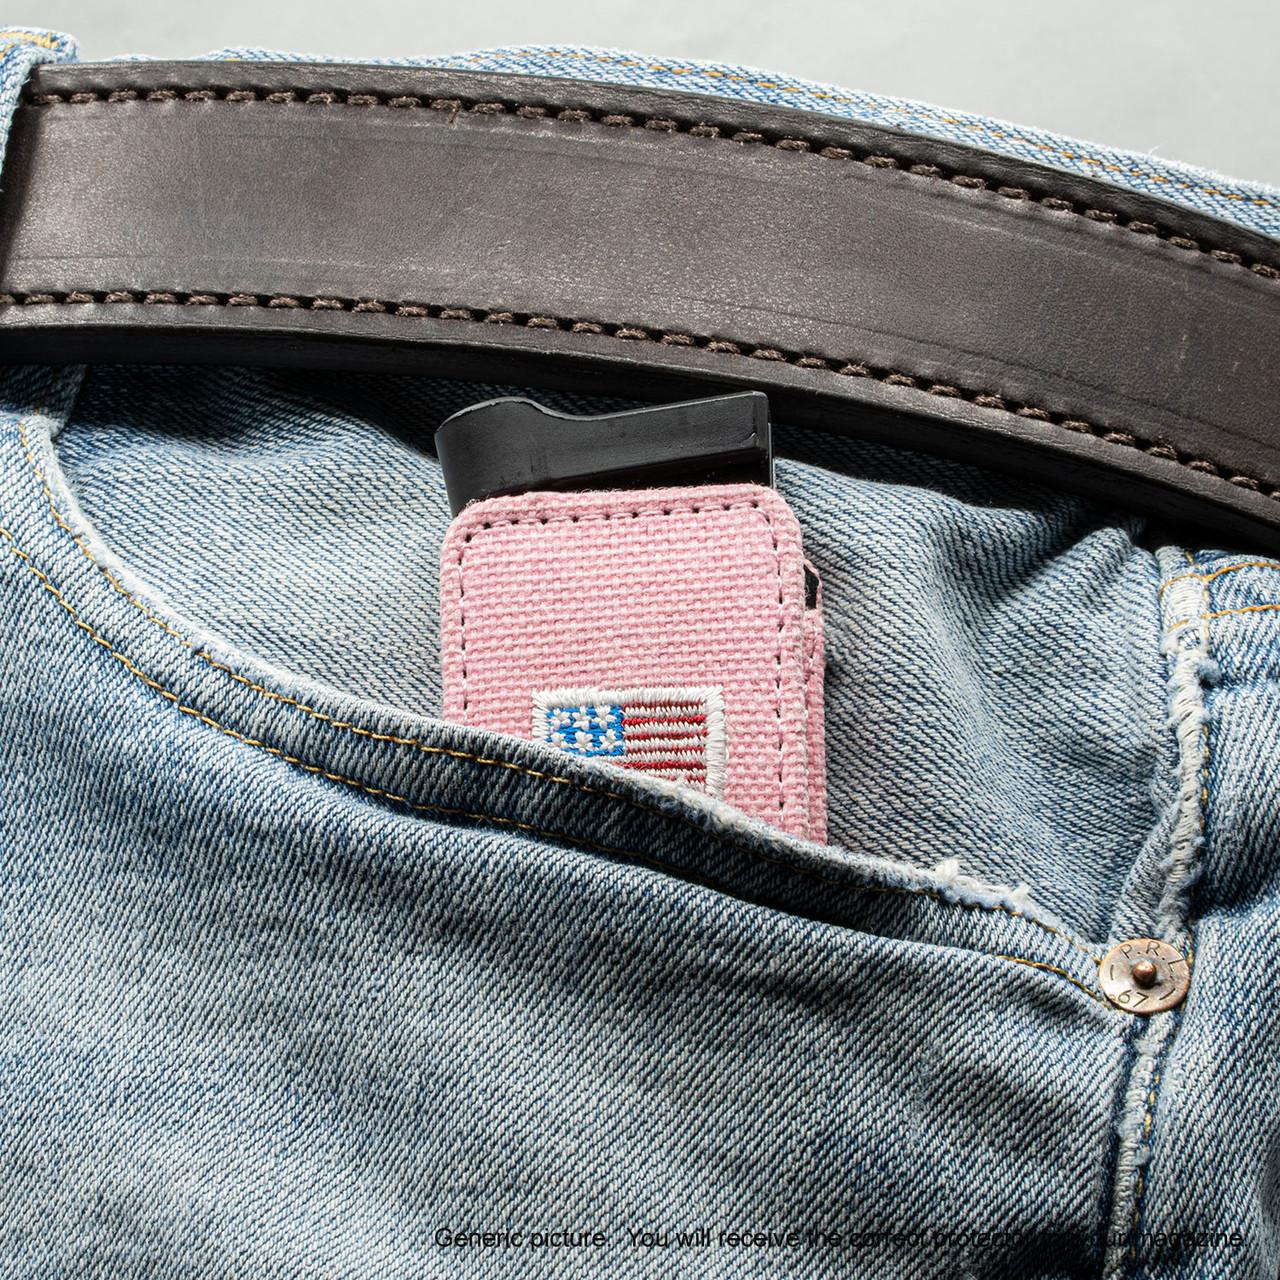 Kahr CW45 Pink Canvas Flag Magazine Pocket Protector